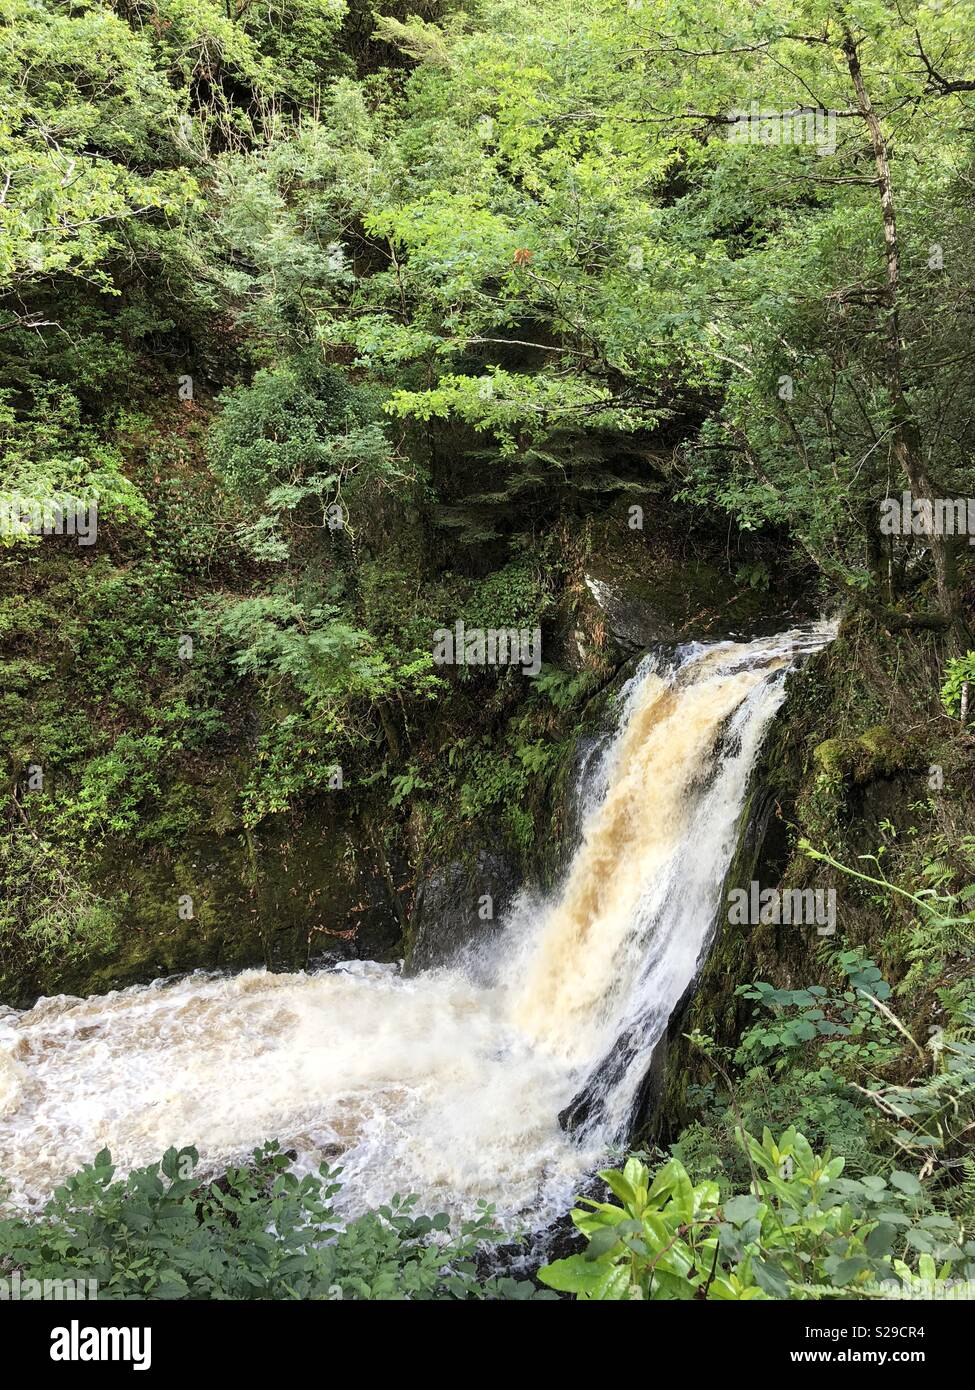 Waterfall near devils bridge - Stock Image